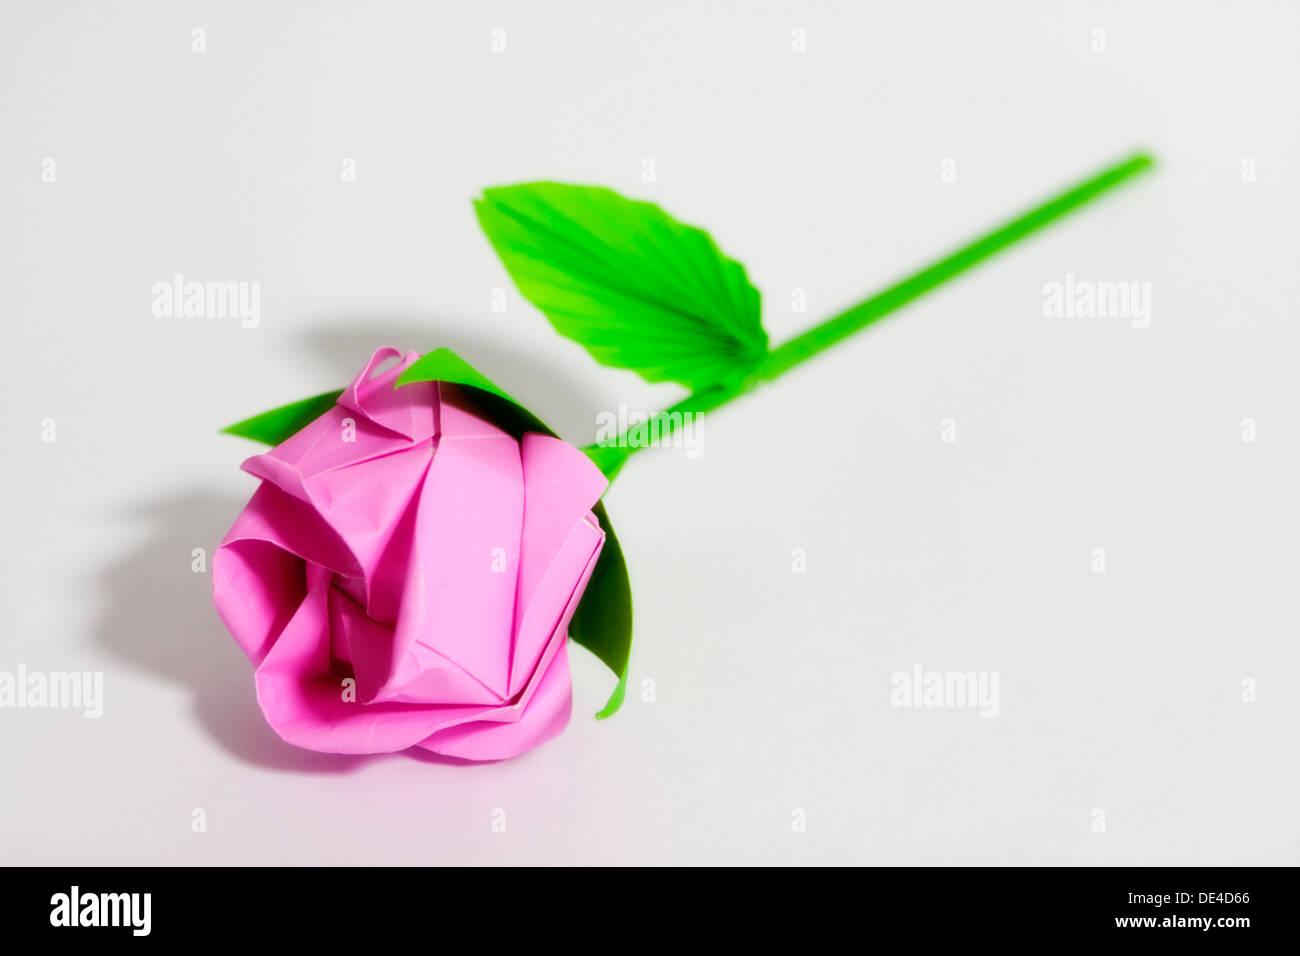 Kawasaki Origami Rose With Leaf And Stem Stock Photo 60334462 Alamy